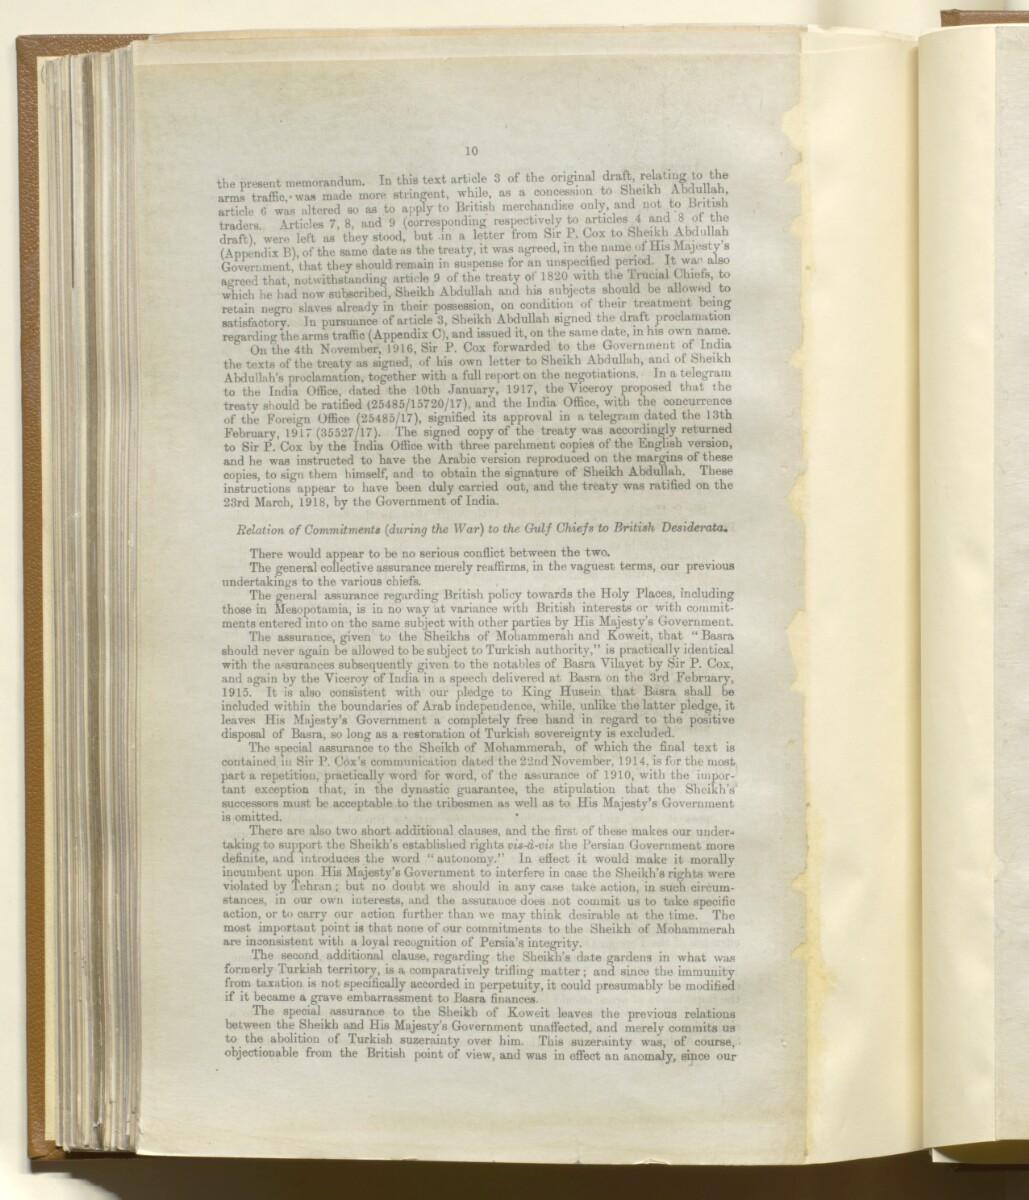 'Memorandum on British Commitments (during the War) to the Gulf Chiefs' [147v] (10/14)